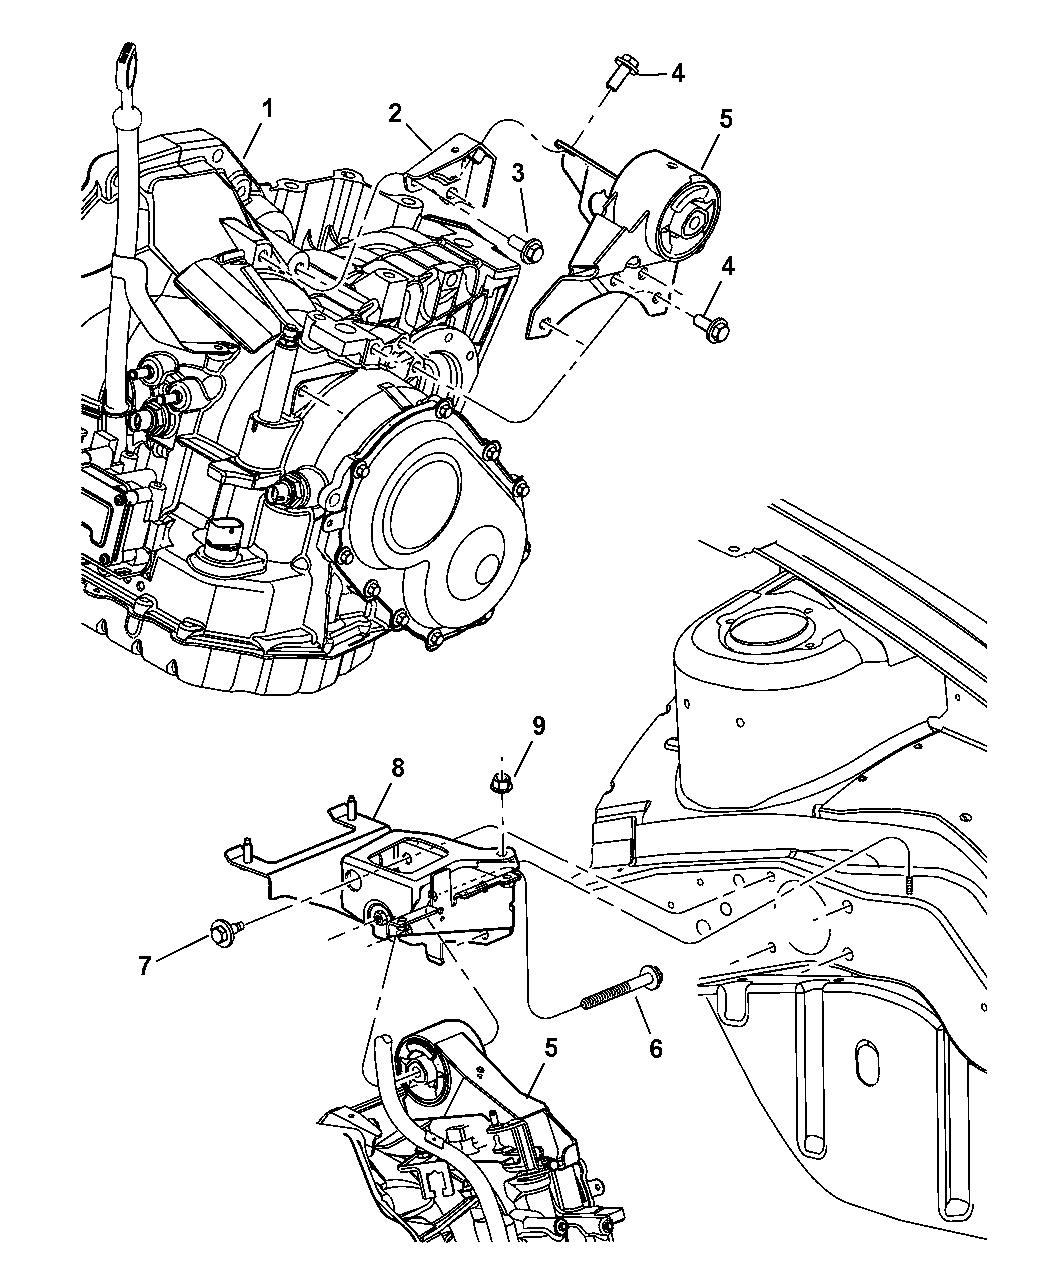 2005 dodge neon mount, transmission - thumbnail 1